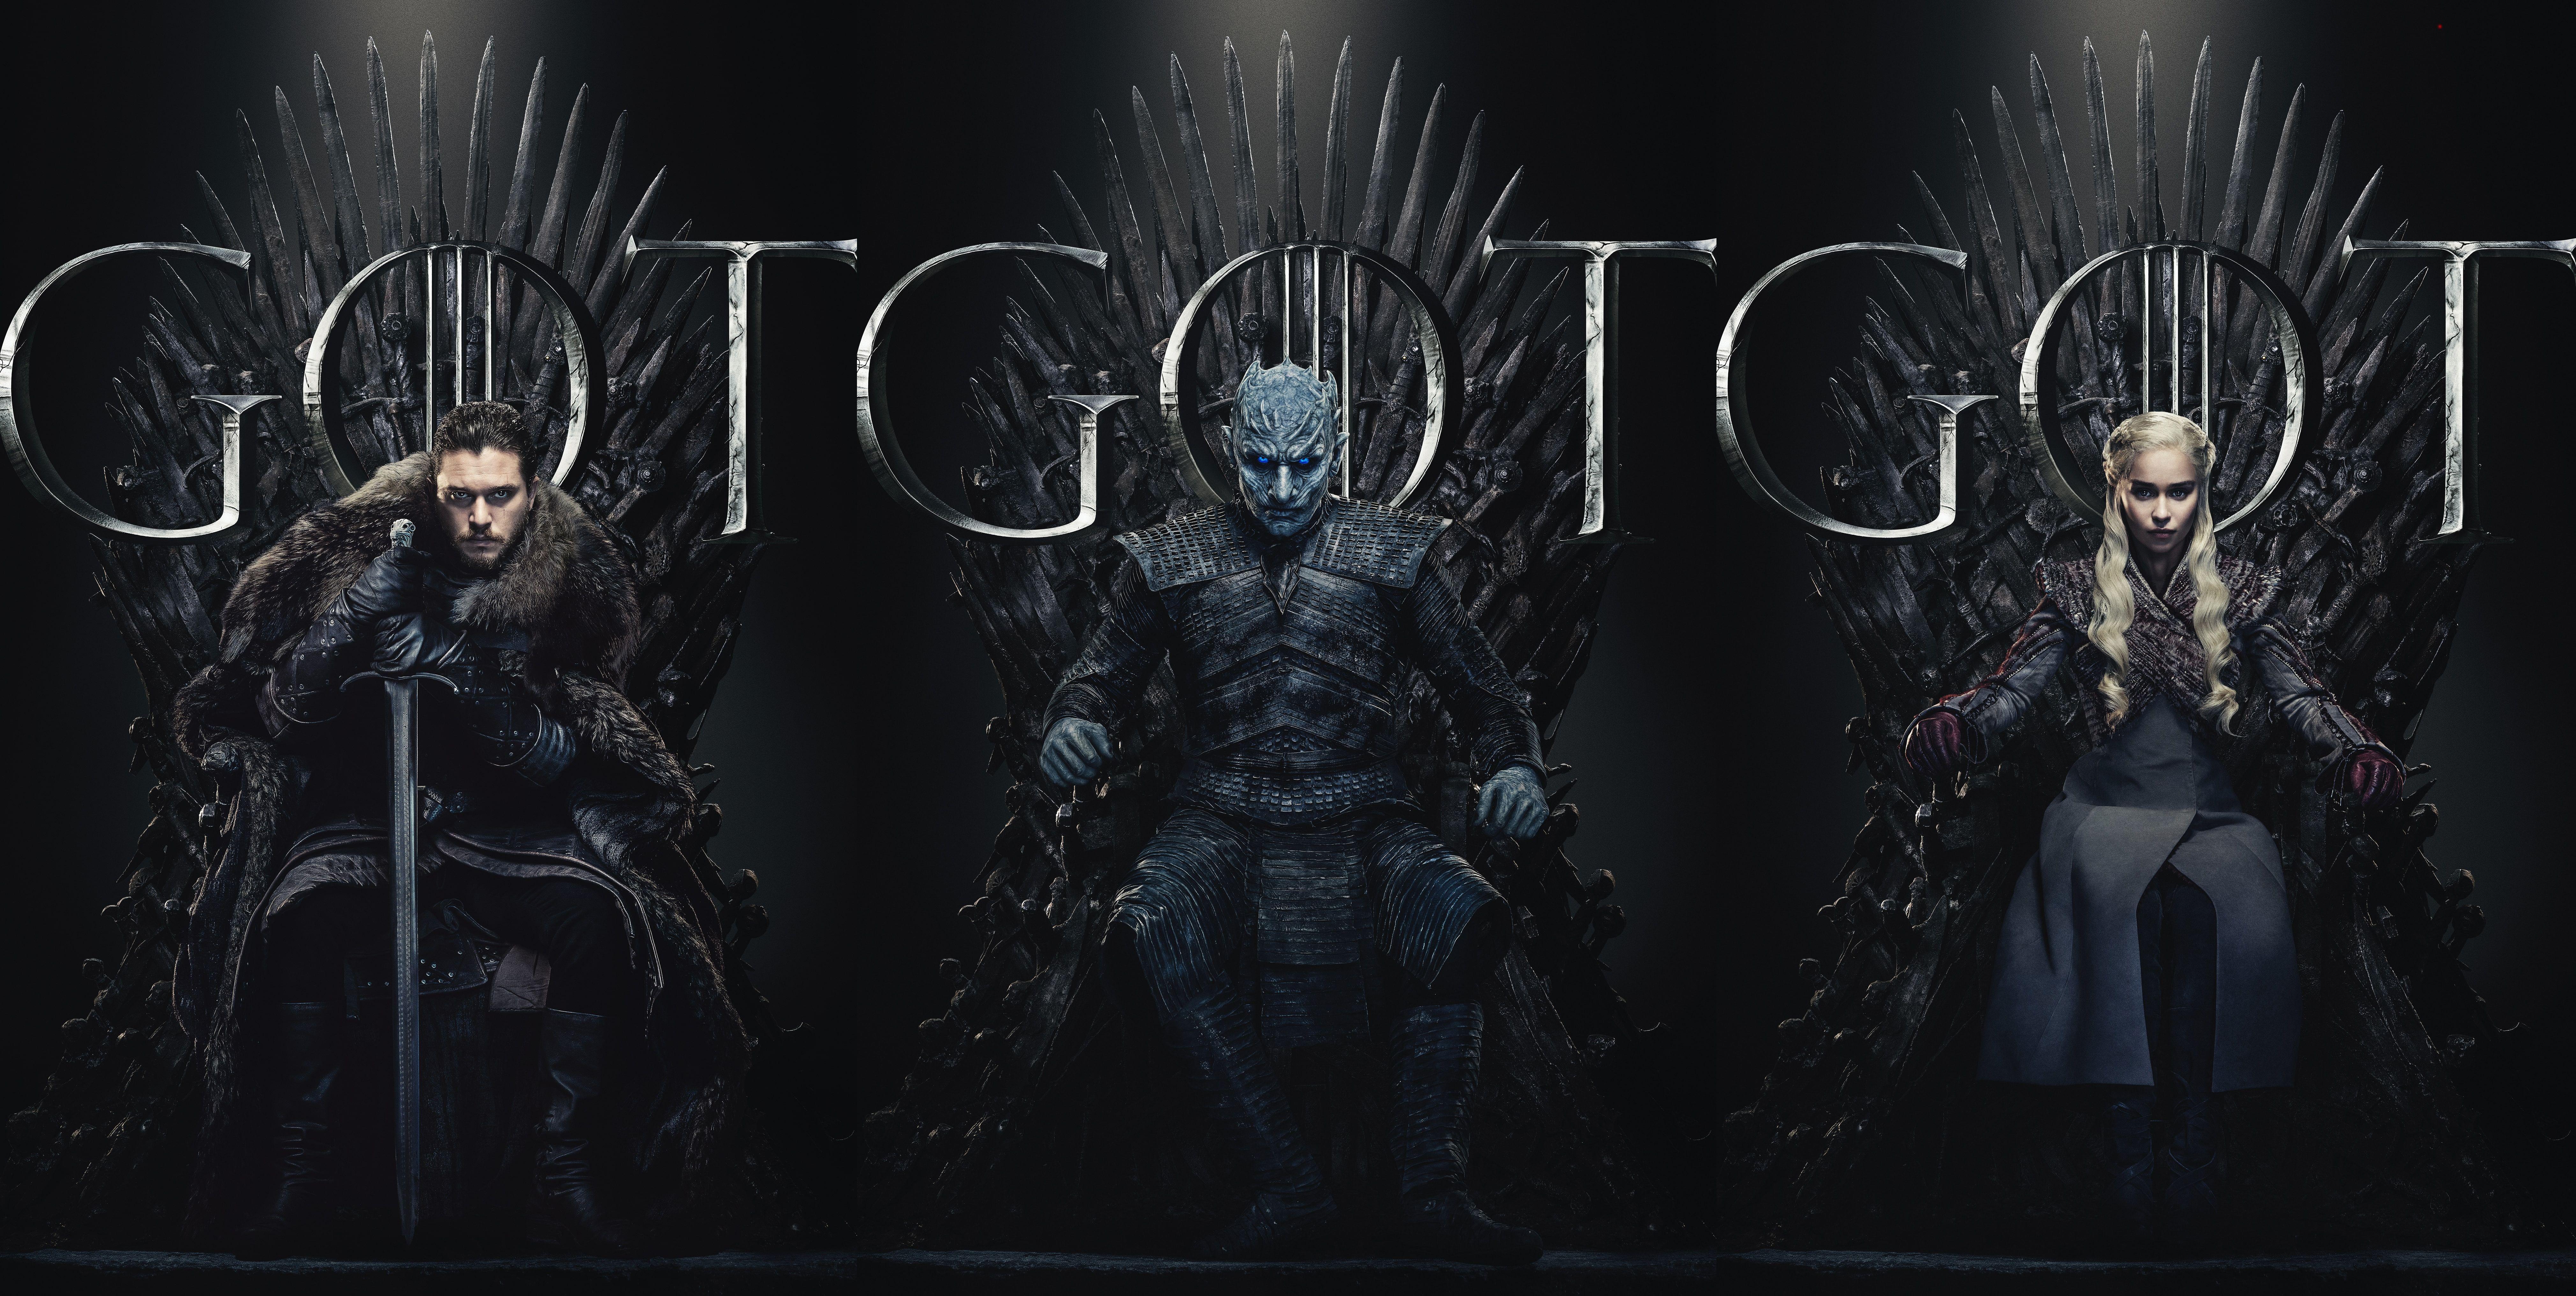 Ultra Hd Game Of Thrones Season 8 Wallpaper